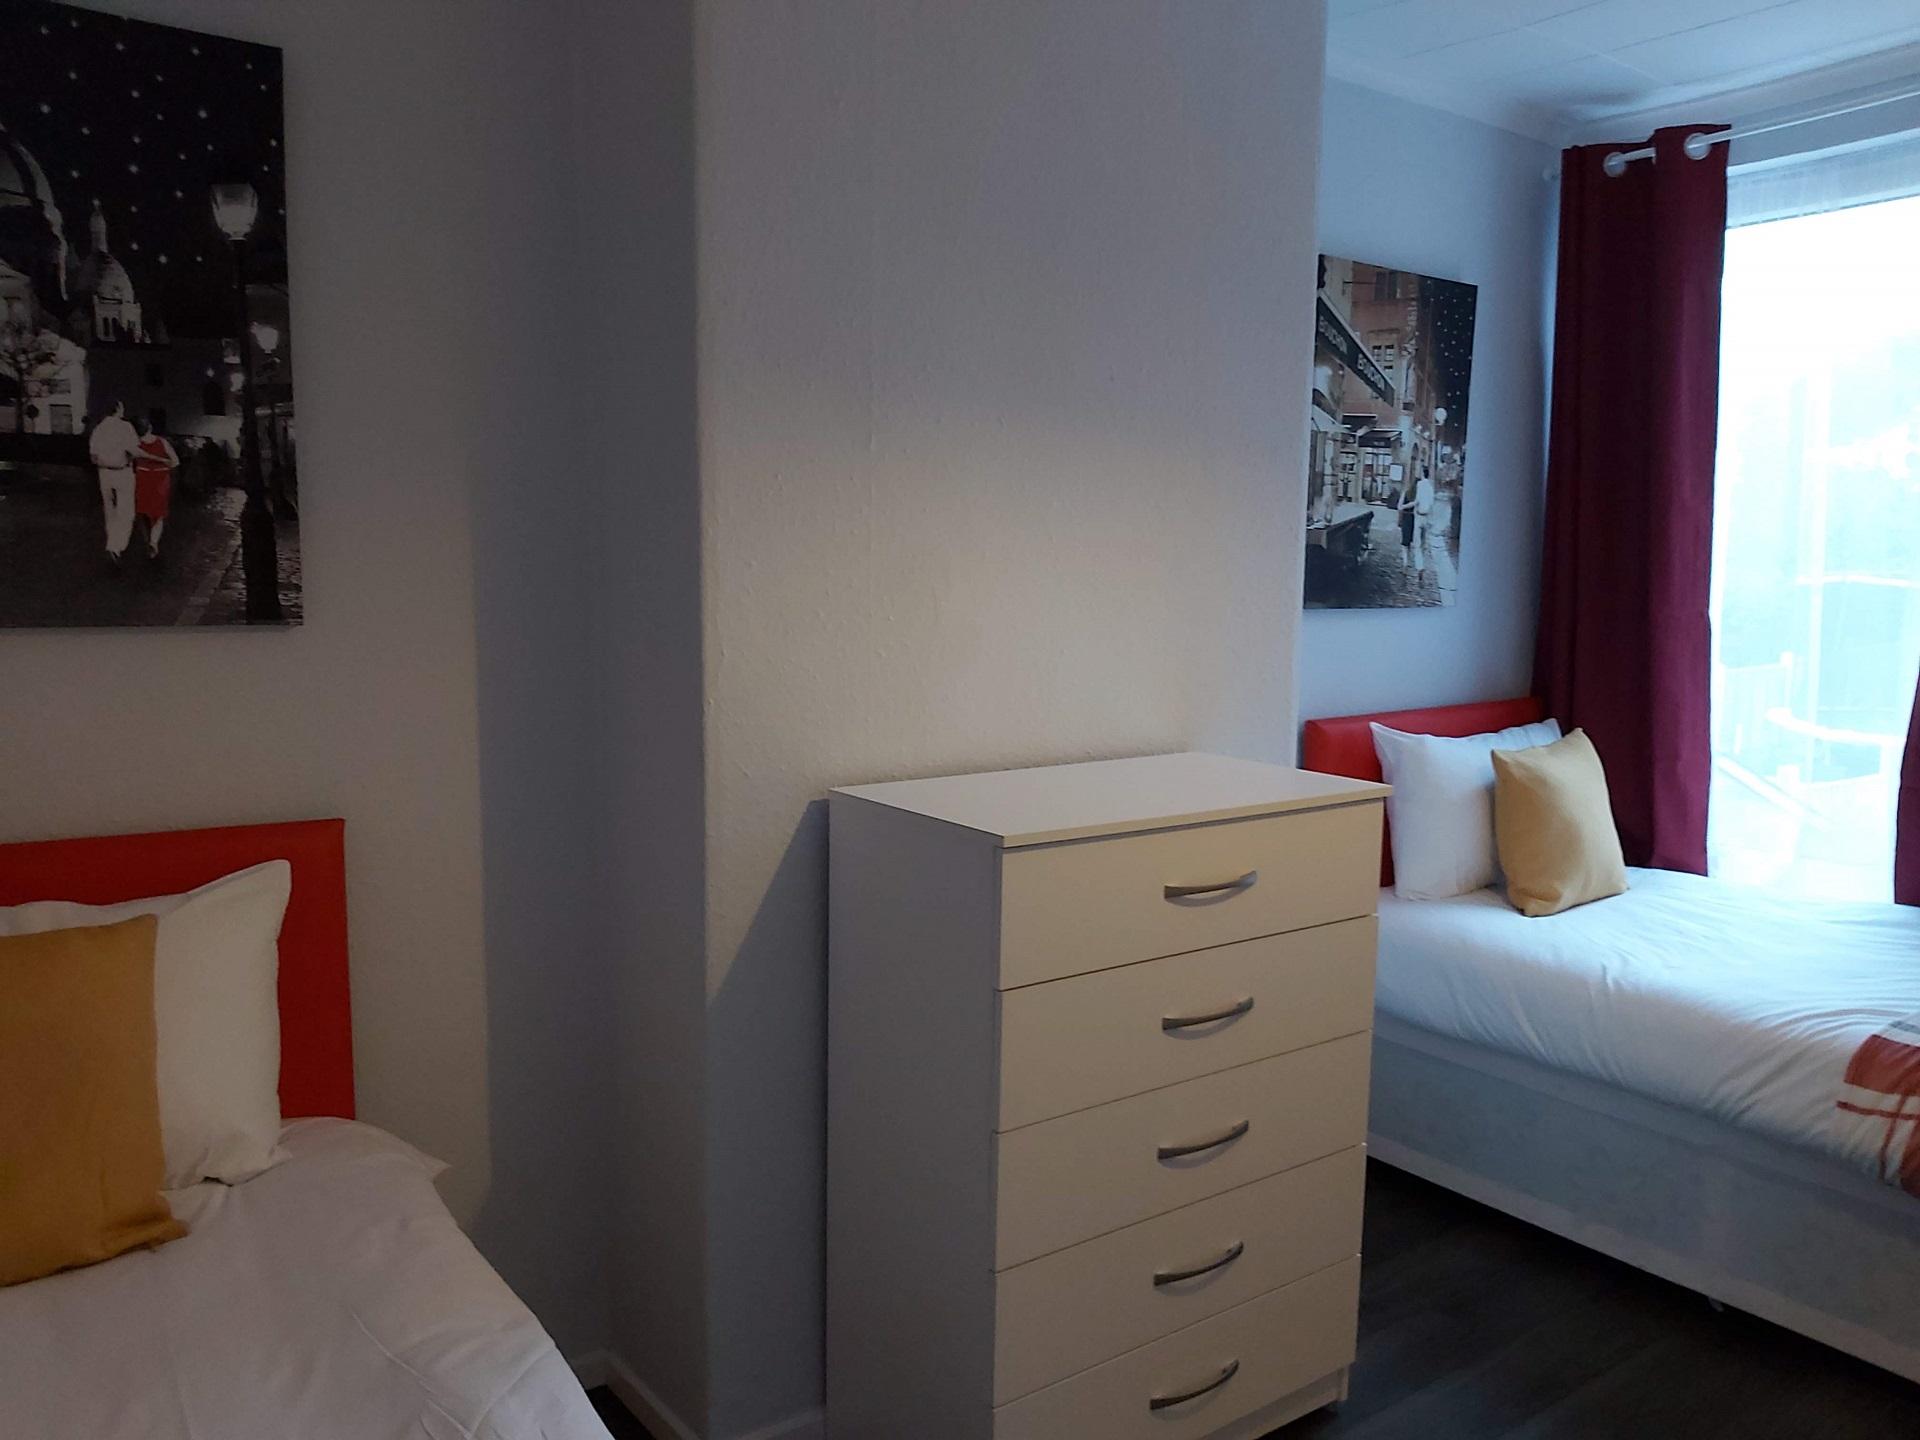 Bedroom at Garden City House, Carlton, Nottingham - Citybase Apartments